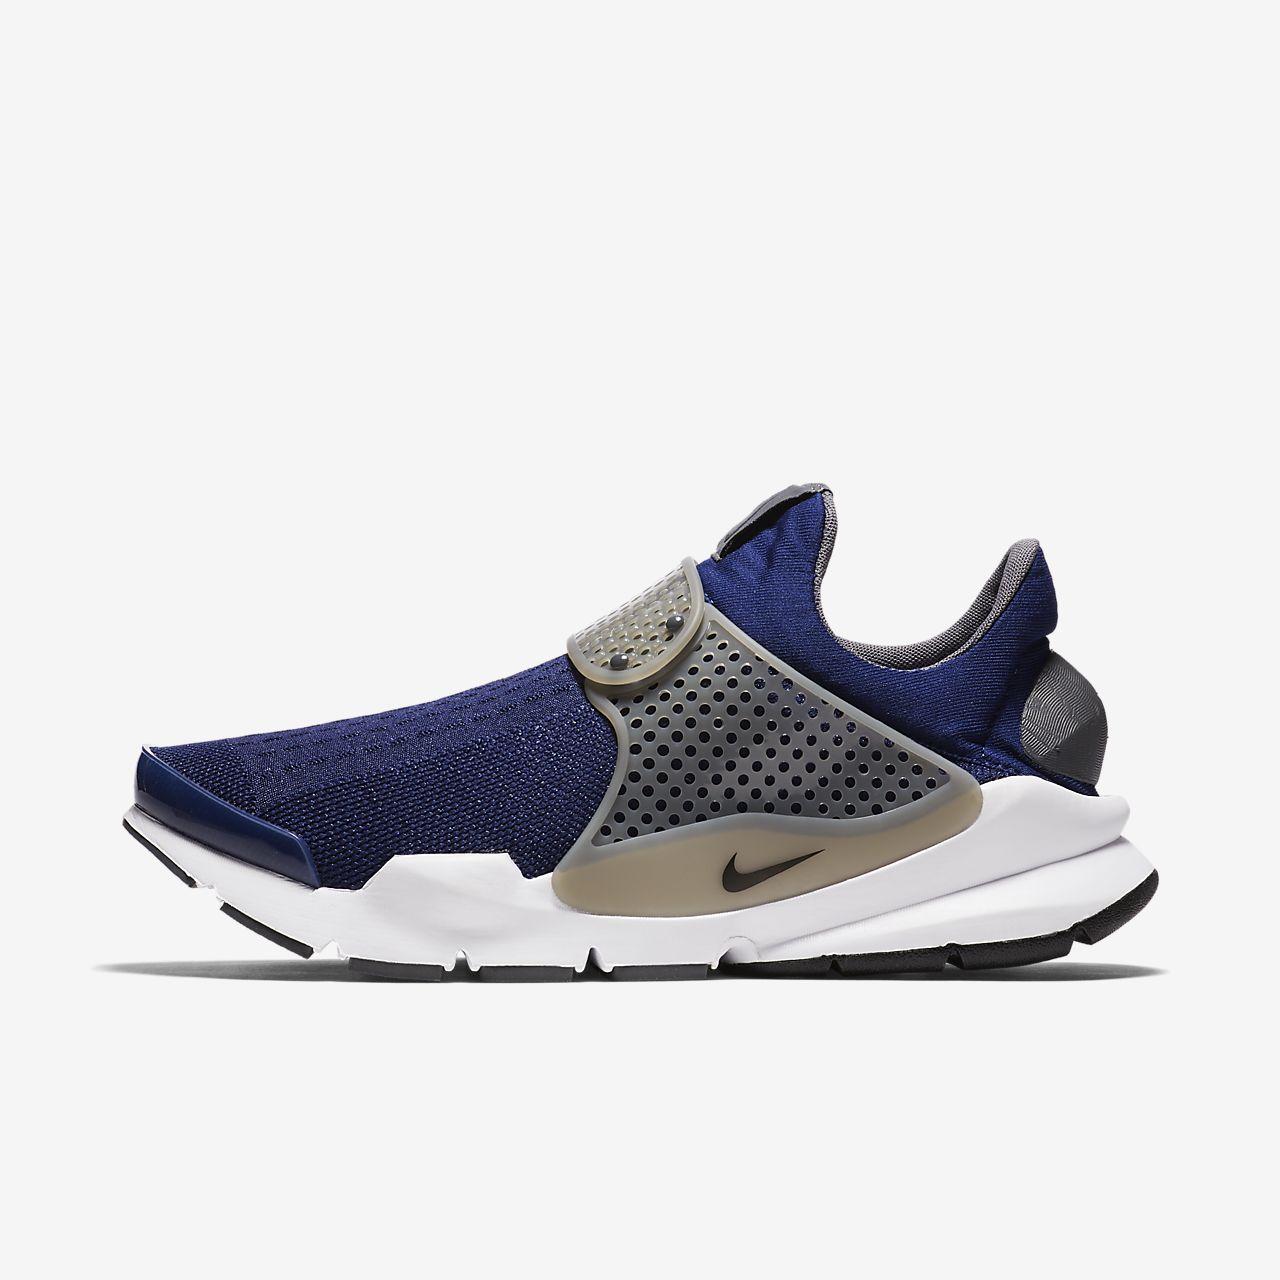 Chaussure Nike Sock Dart Wenn Herren Sportschuhe